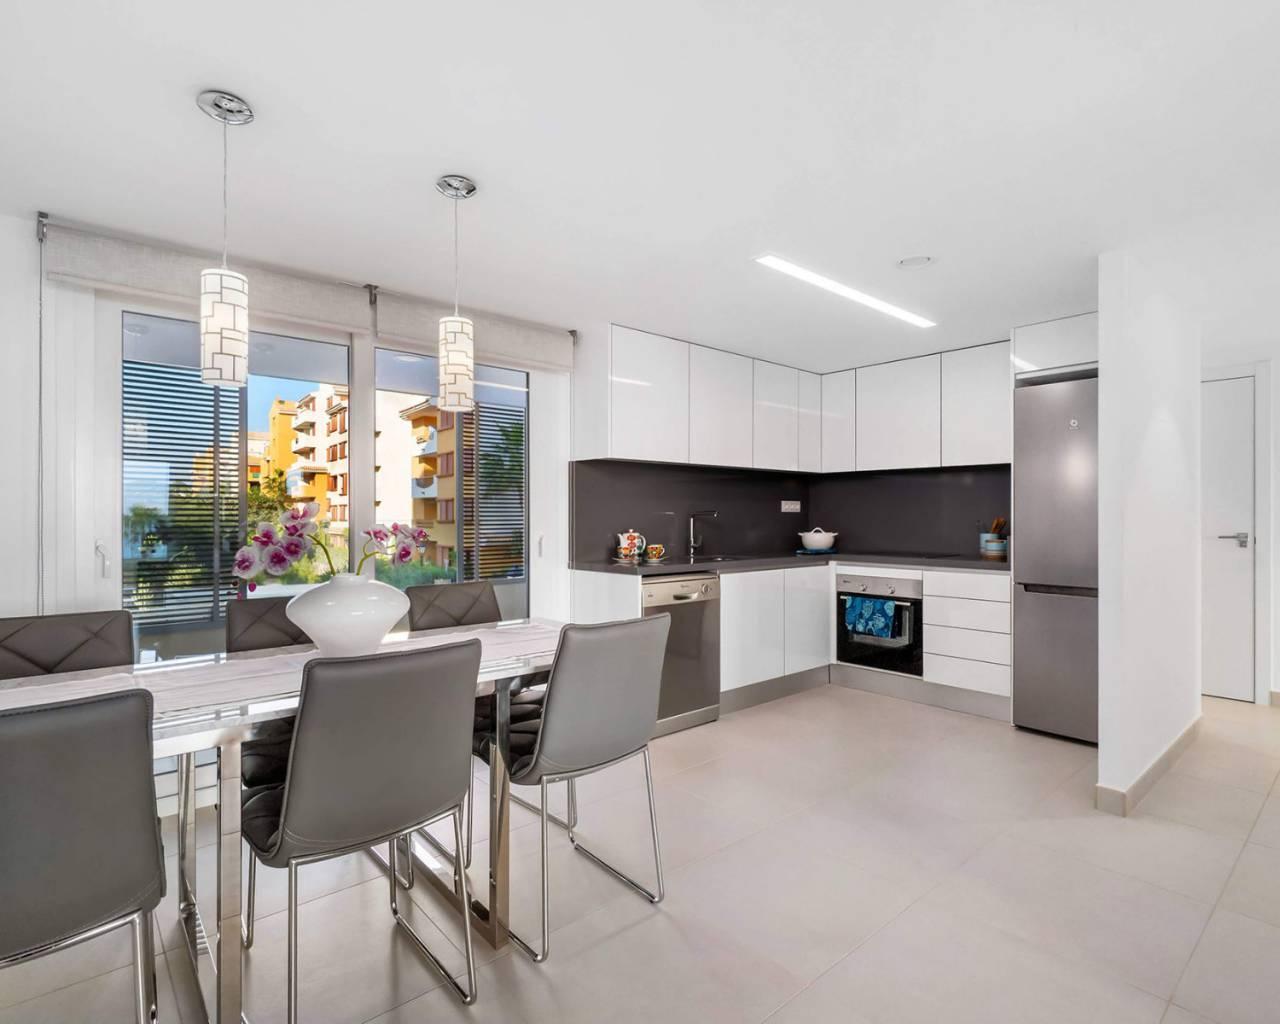 nieuwbouw-appartement-torrevieja-punta-prima_2896_xl